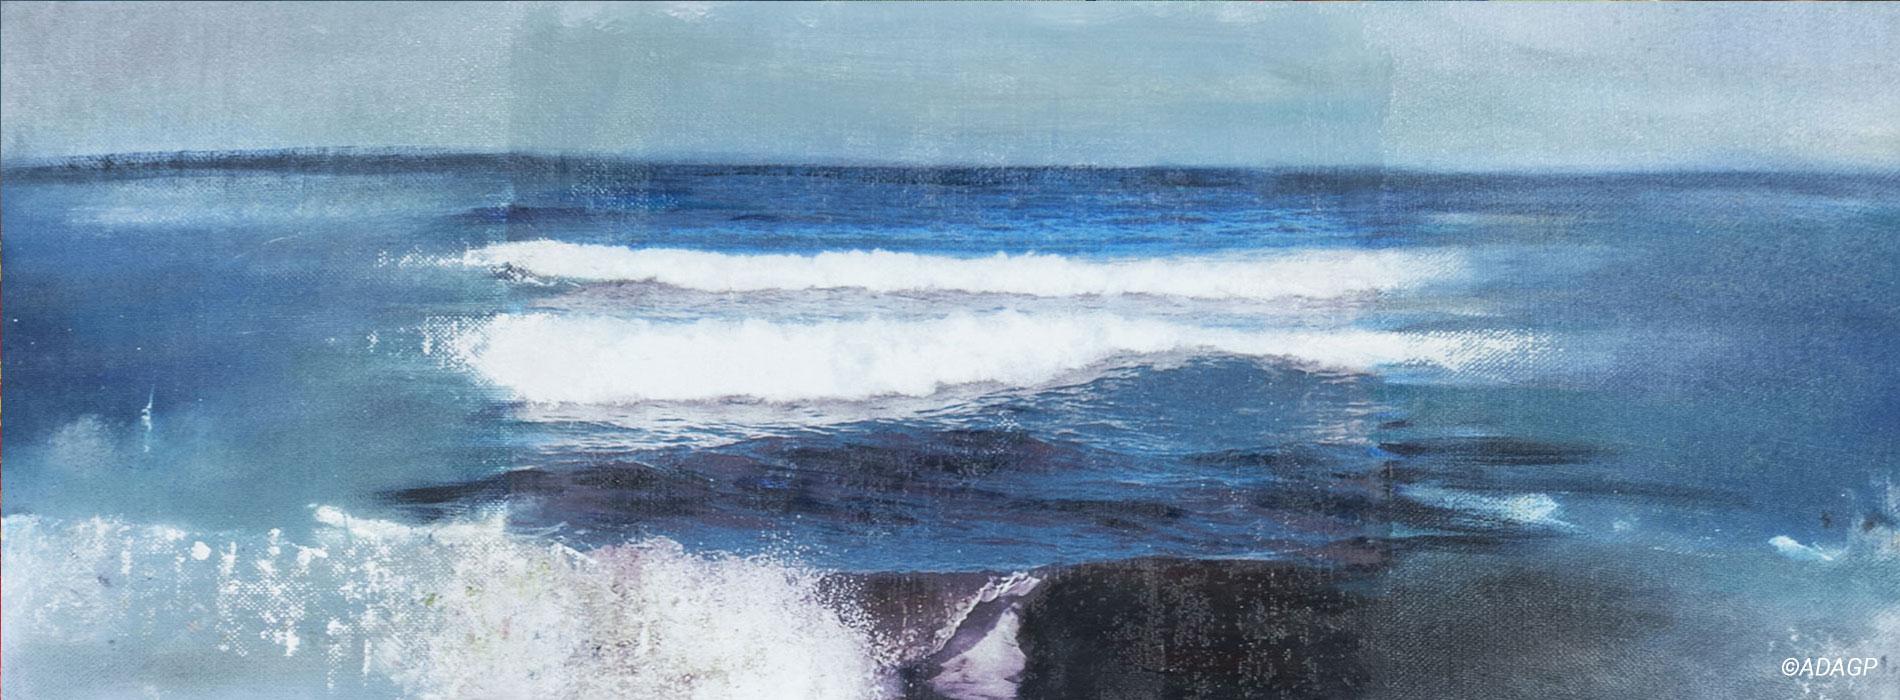 Illustration thème océans (large)